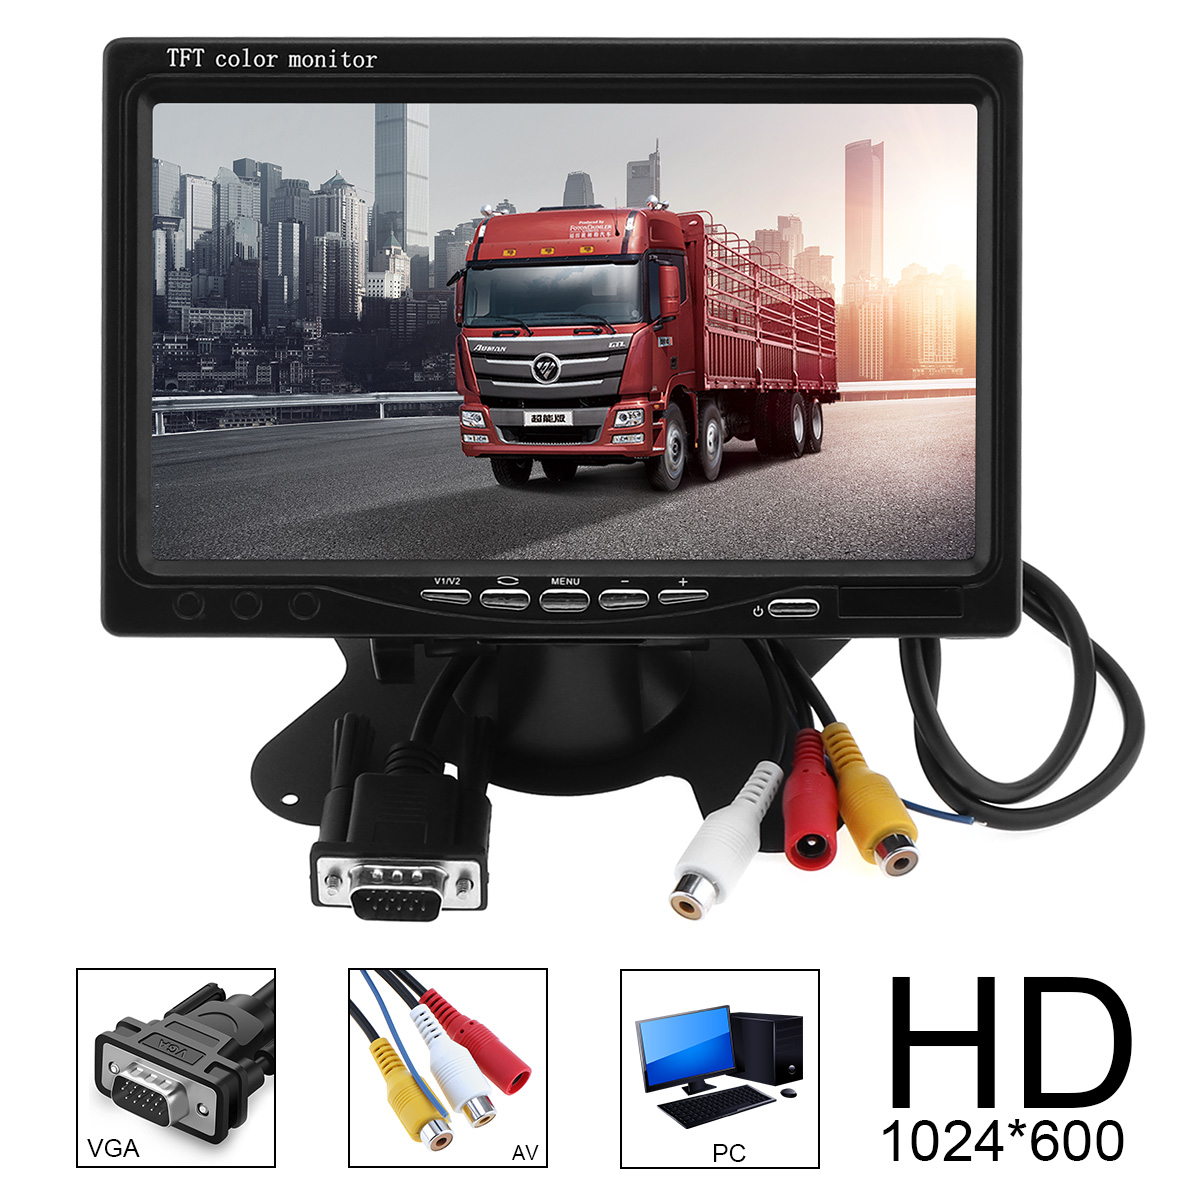 1024x600 7 zoll Ultra Dünne TFT LCD HD Monitor Audio Video AV Auto Home Monitor Helle Farbe mit VGA Interface